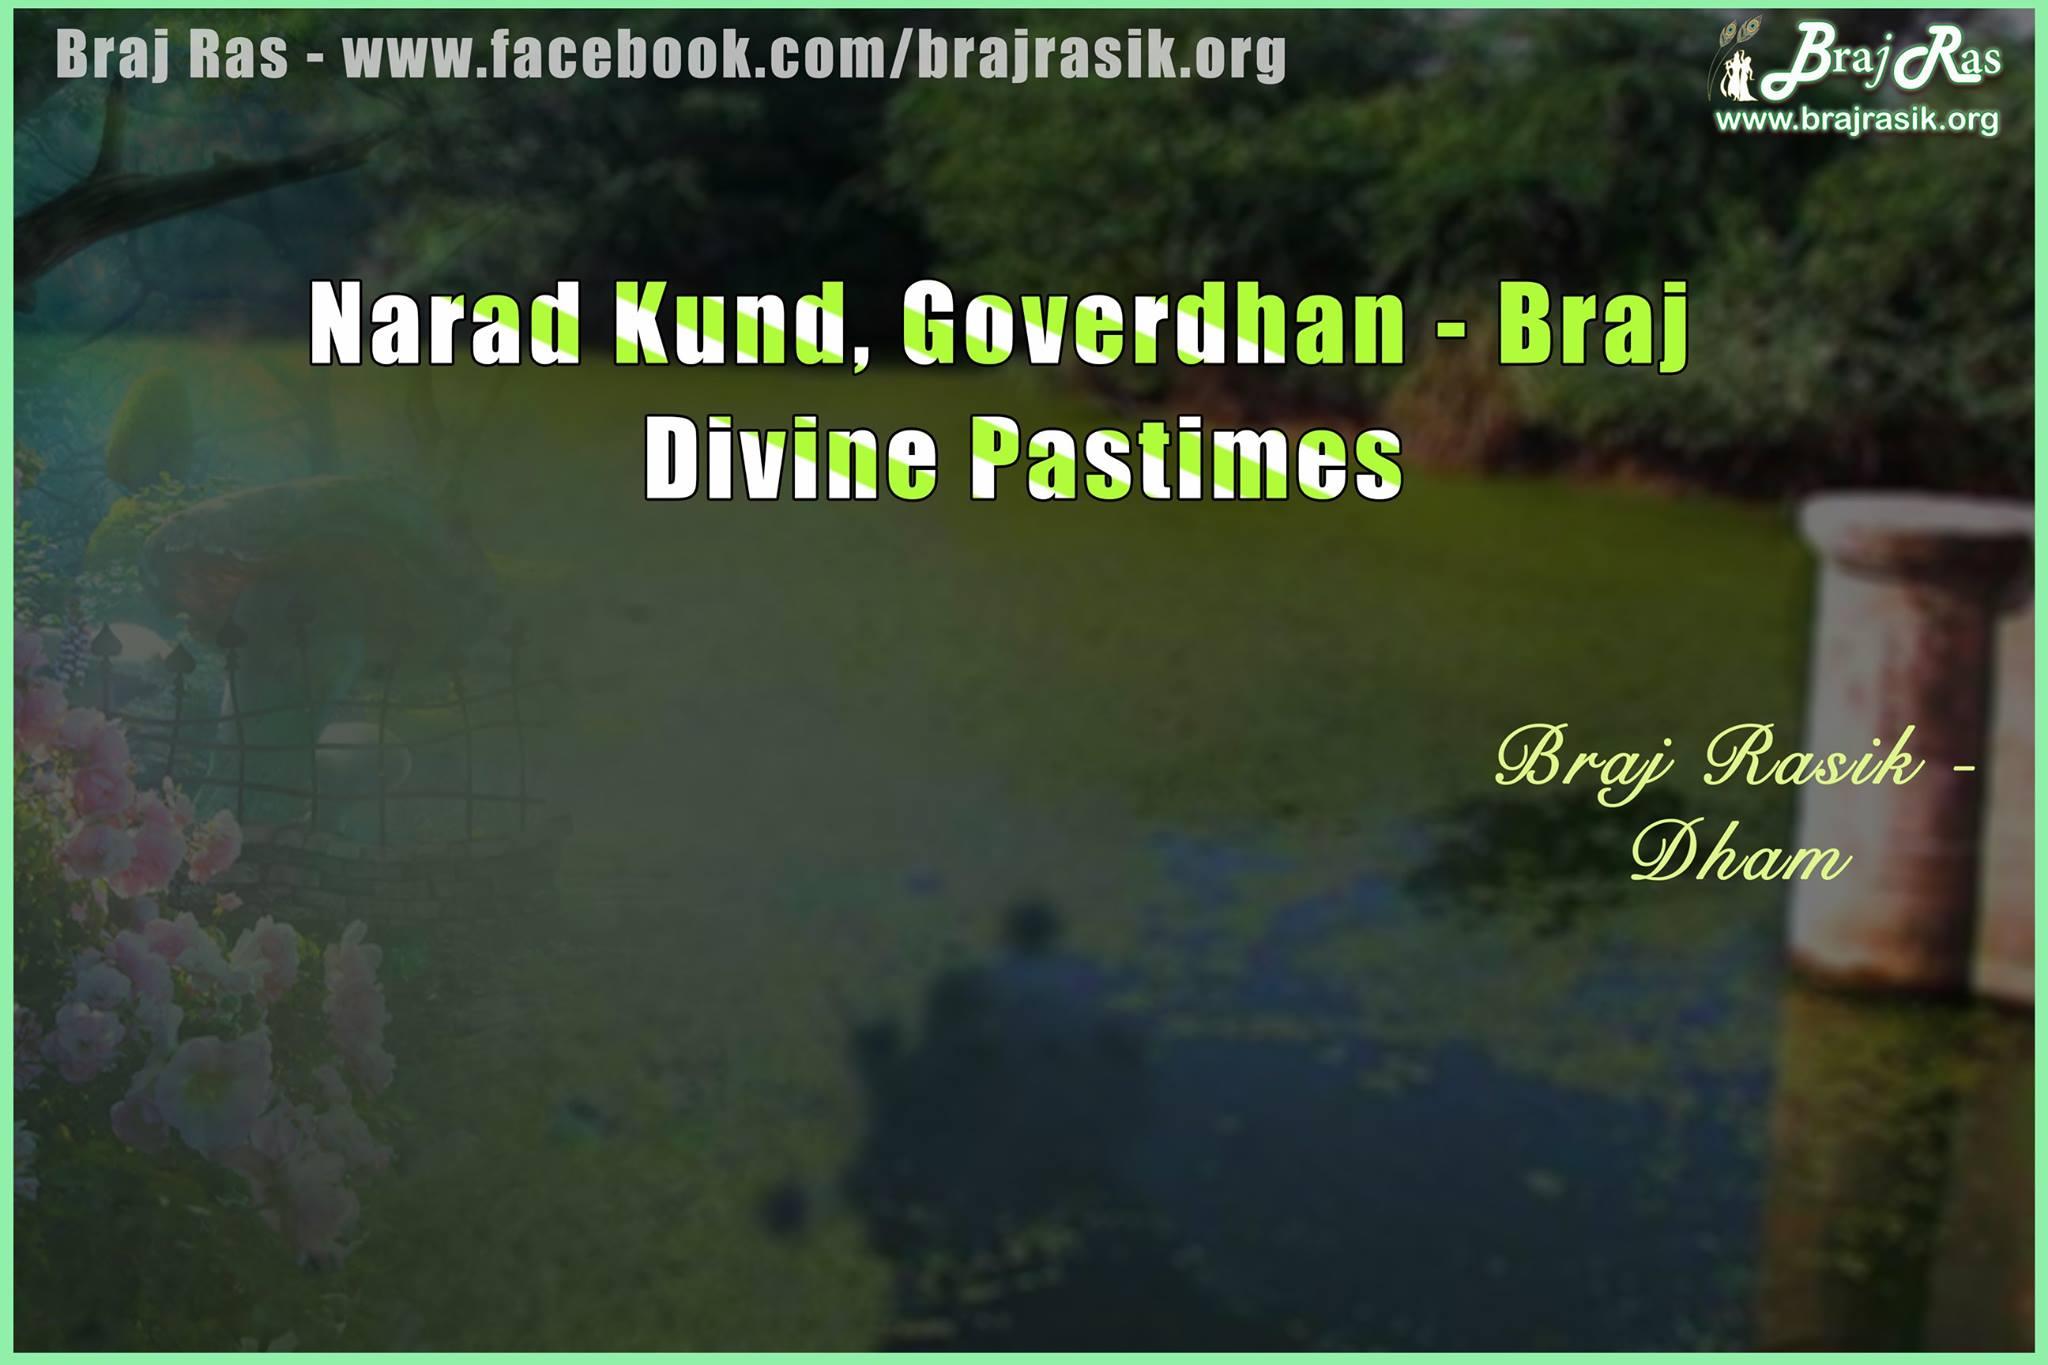 Narad Kund, Goverdhan - Braj